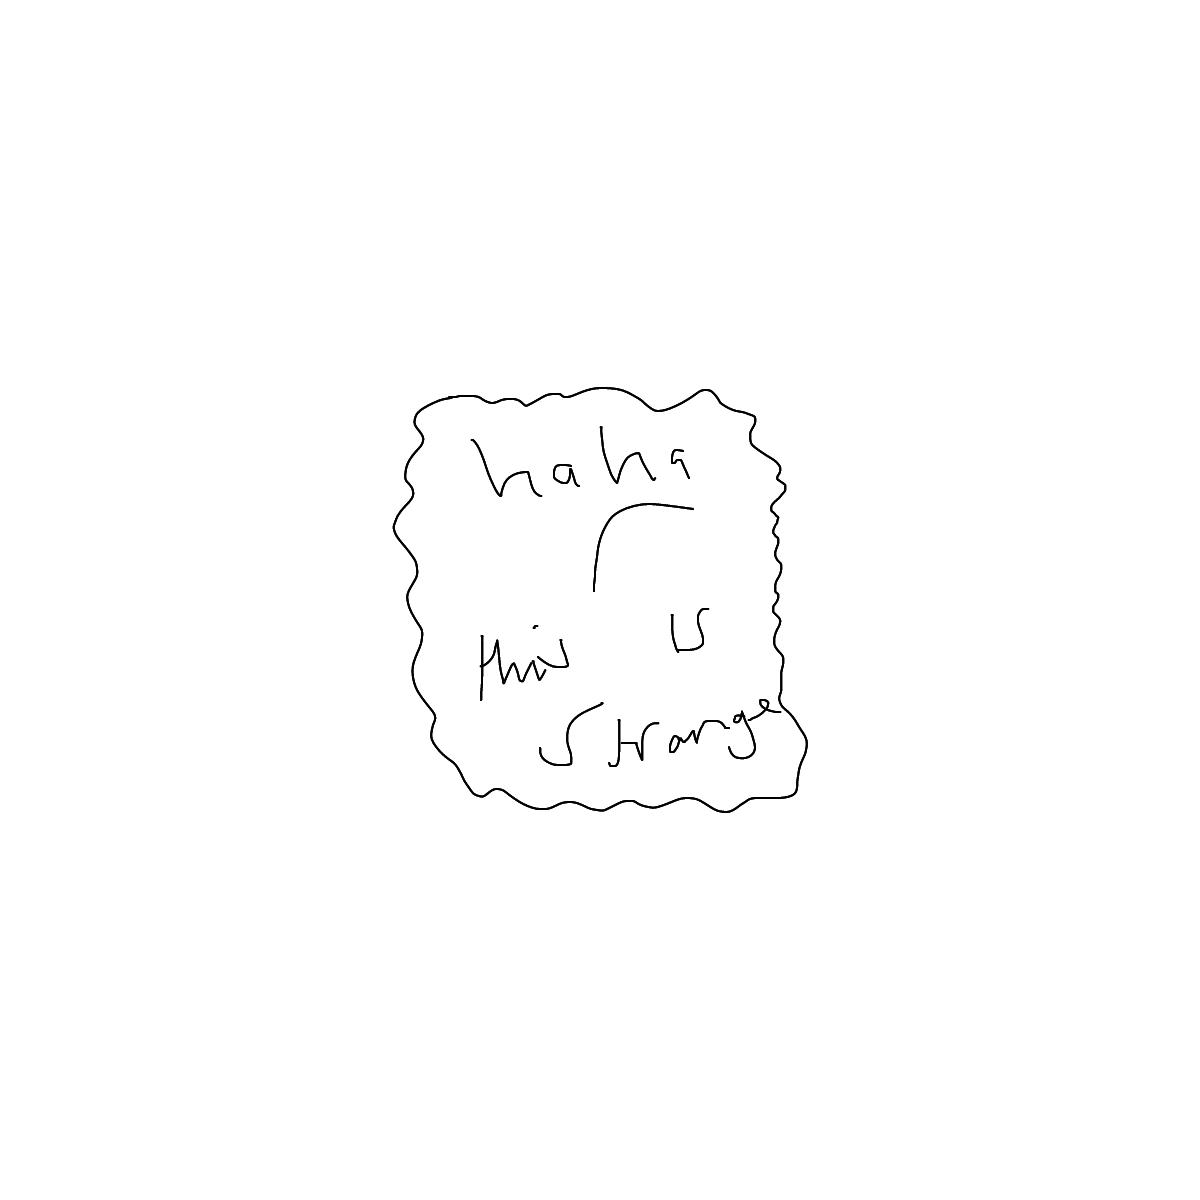 BAAAM drawing#1227 lat:49.9794921875000000lng: -1.5820252895355225